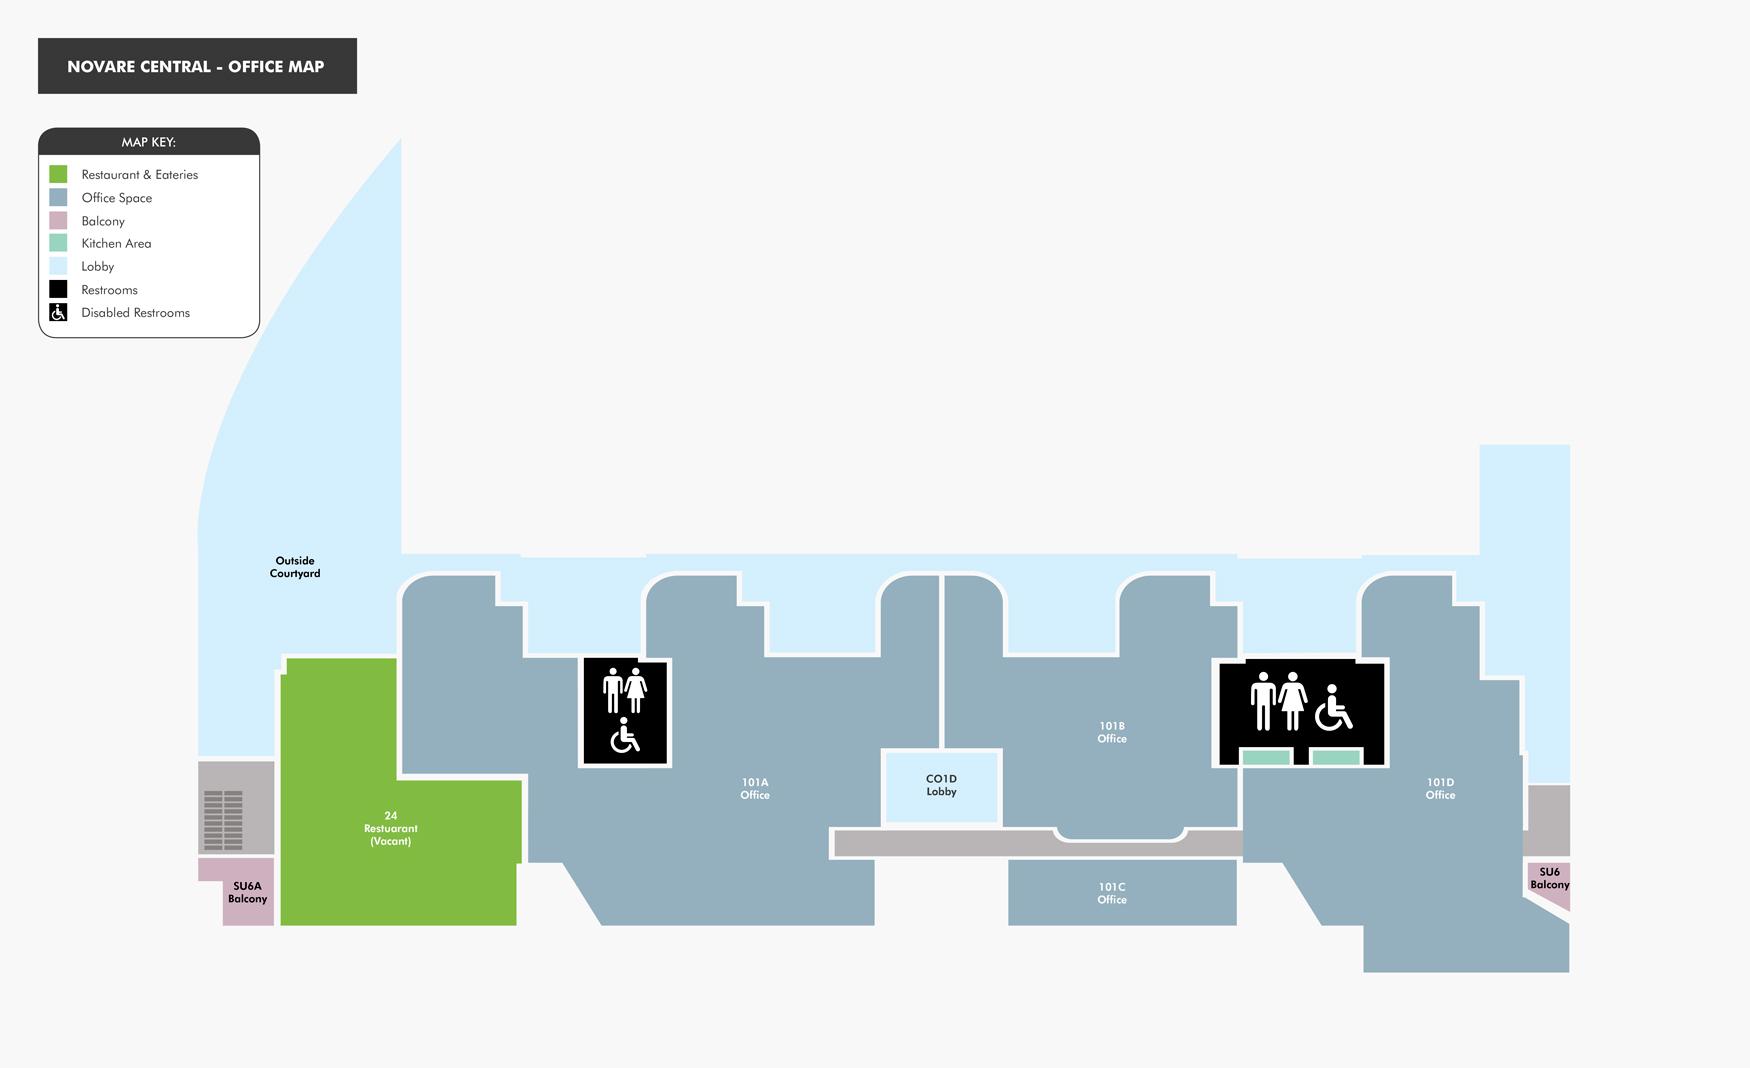 Shopping Mall map